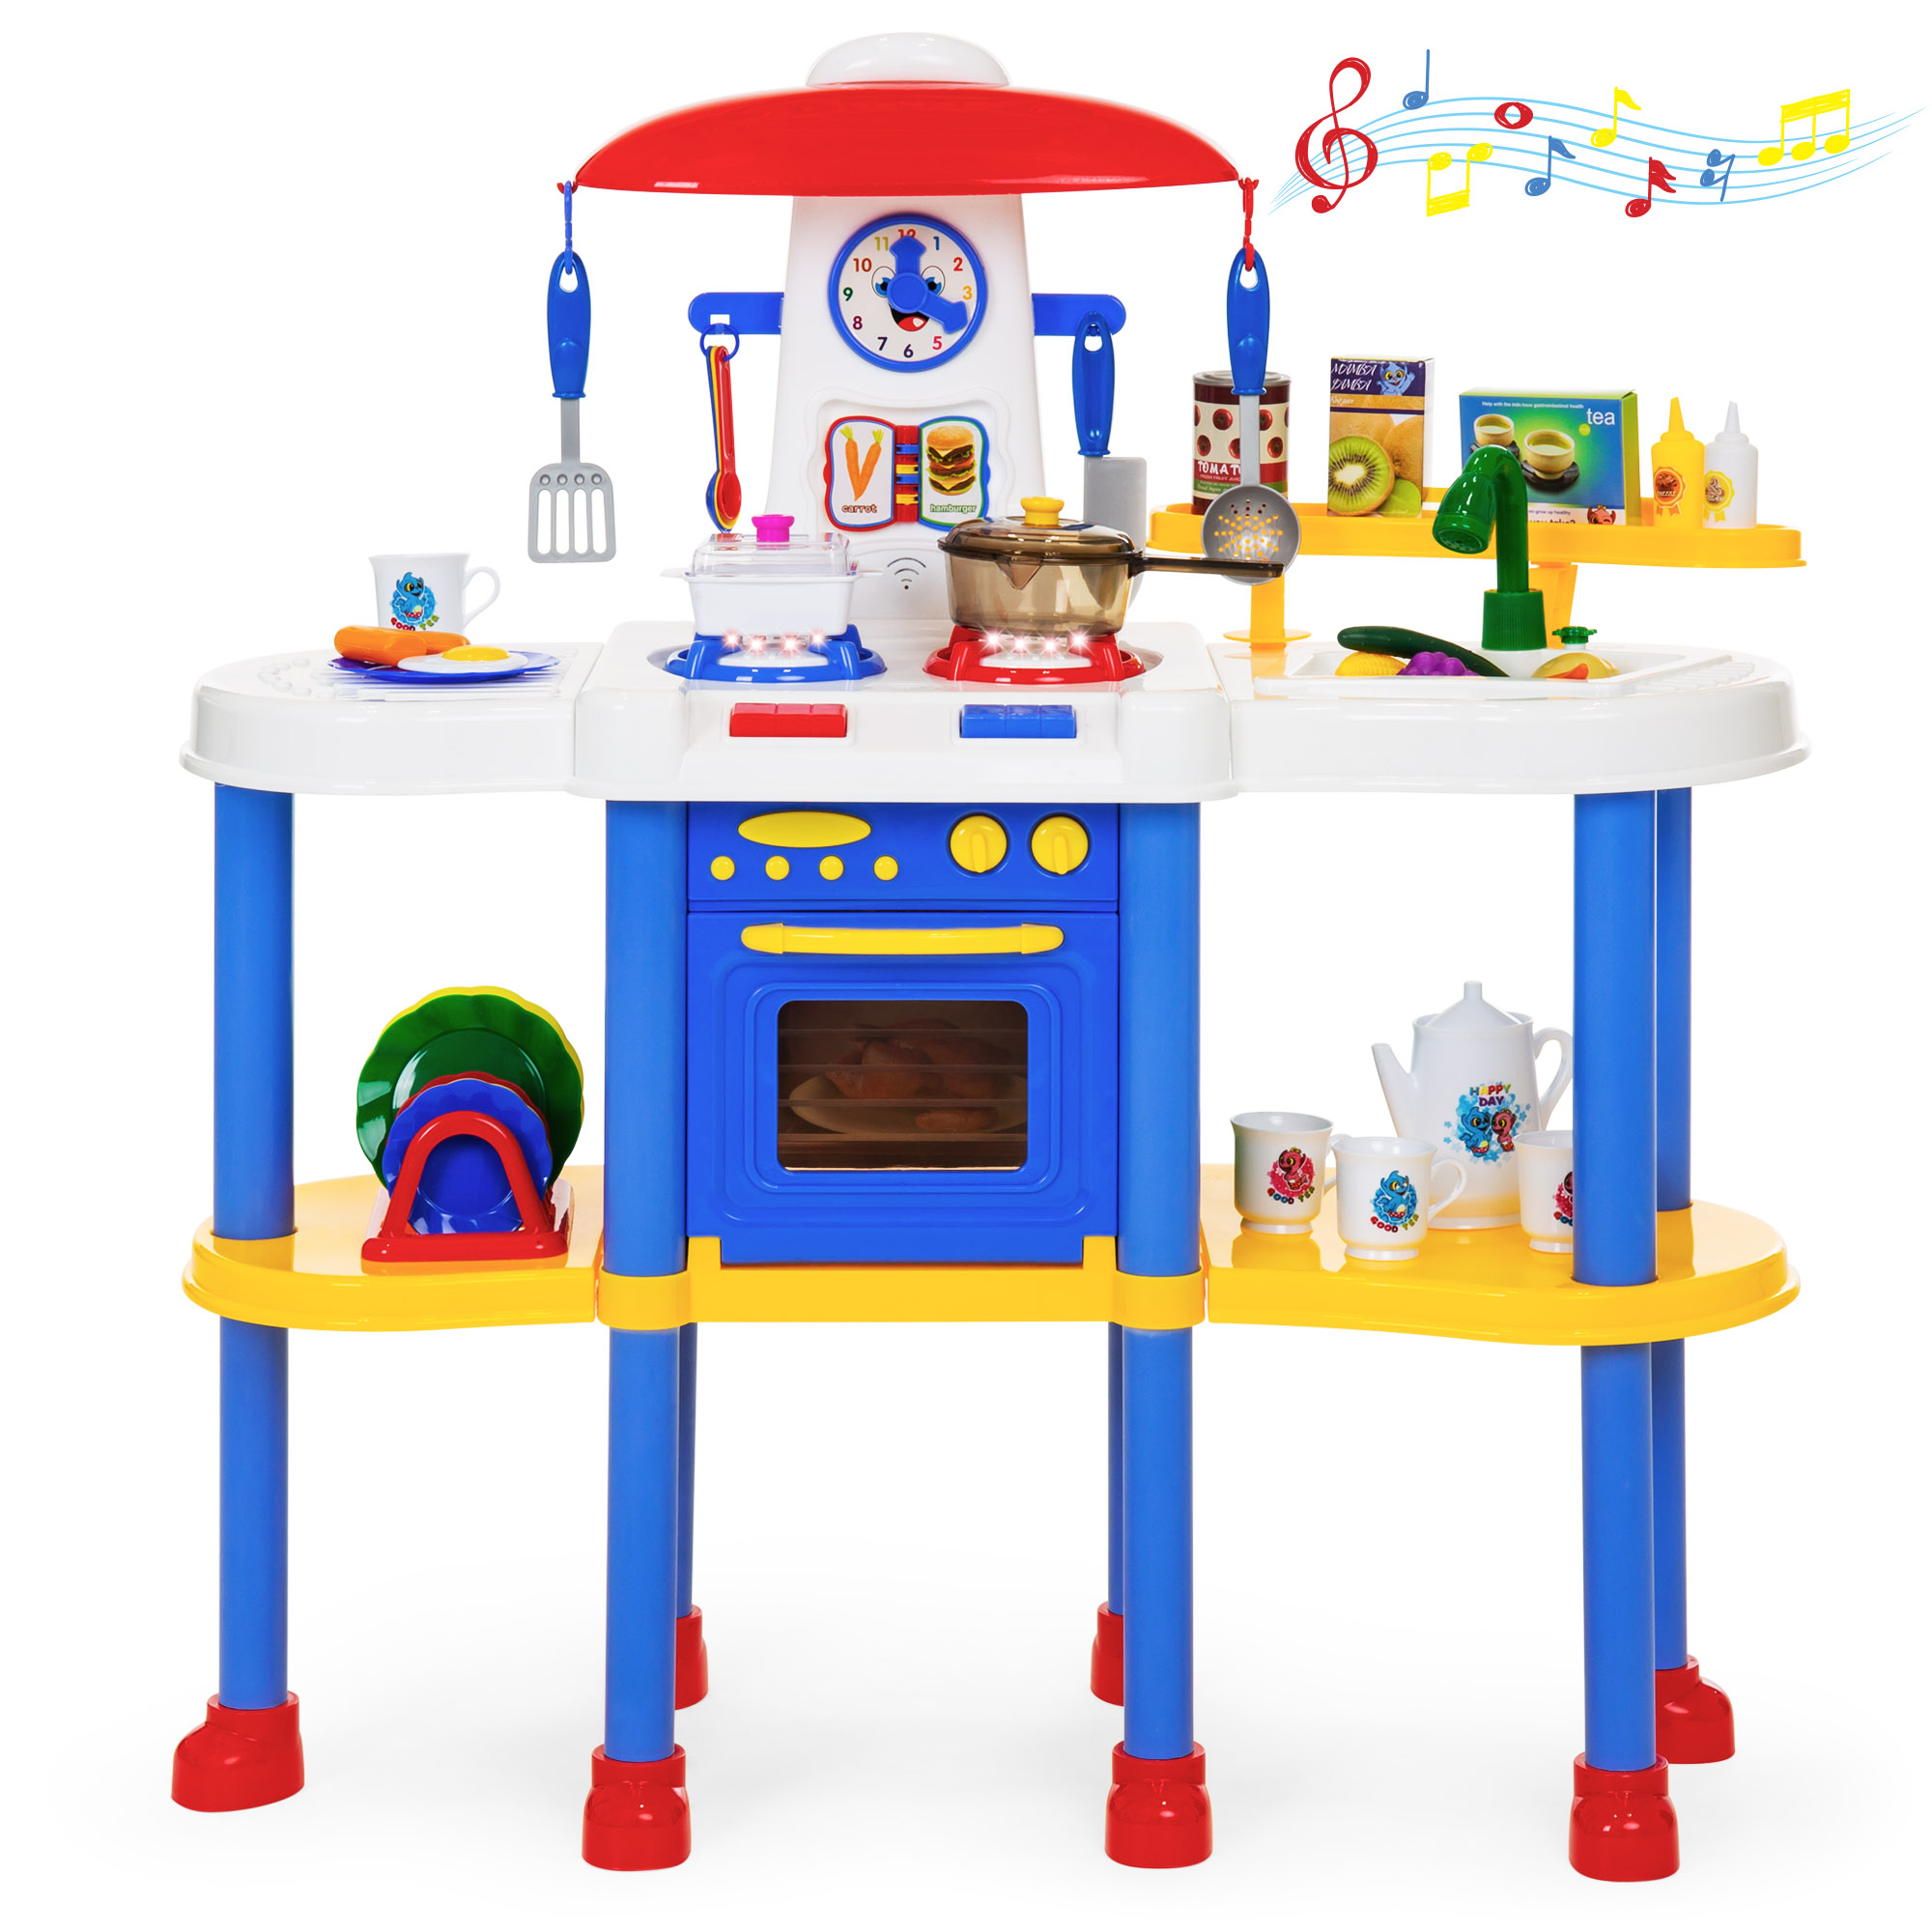 Kids Pretend Kitchen Cooking Cookware